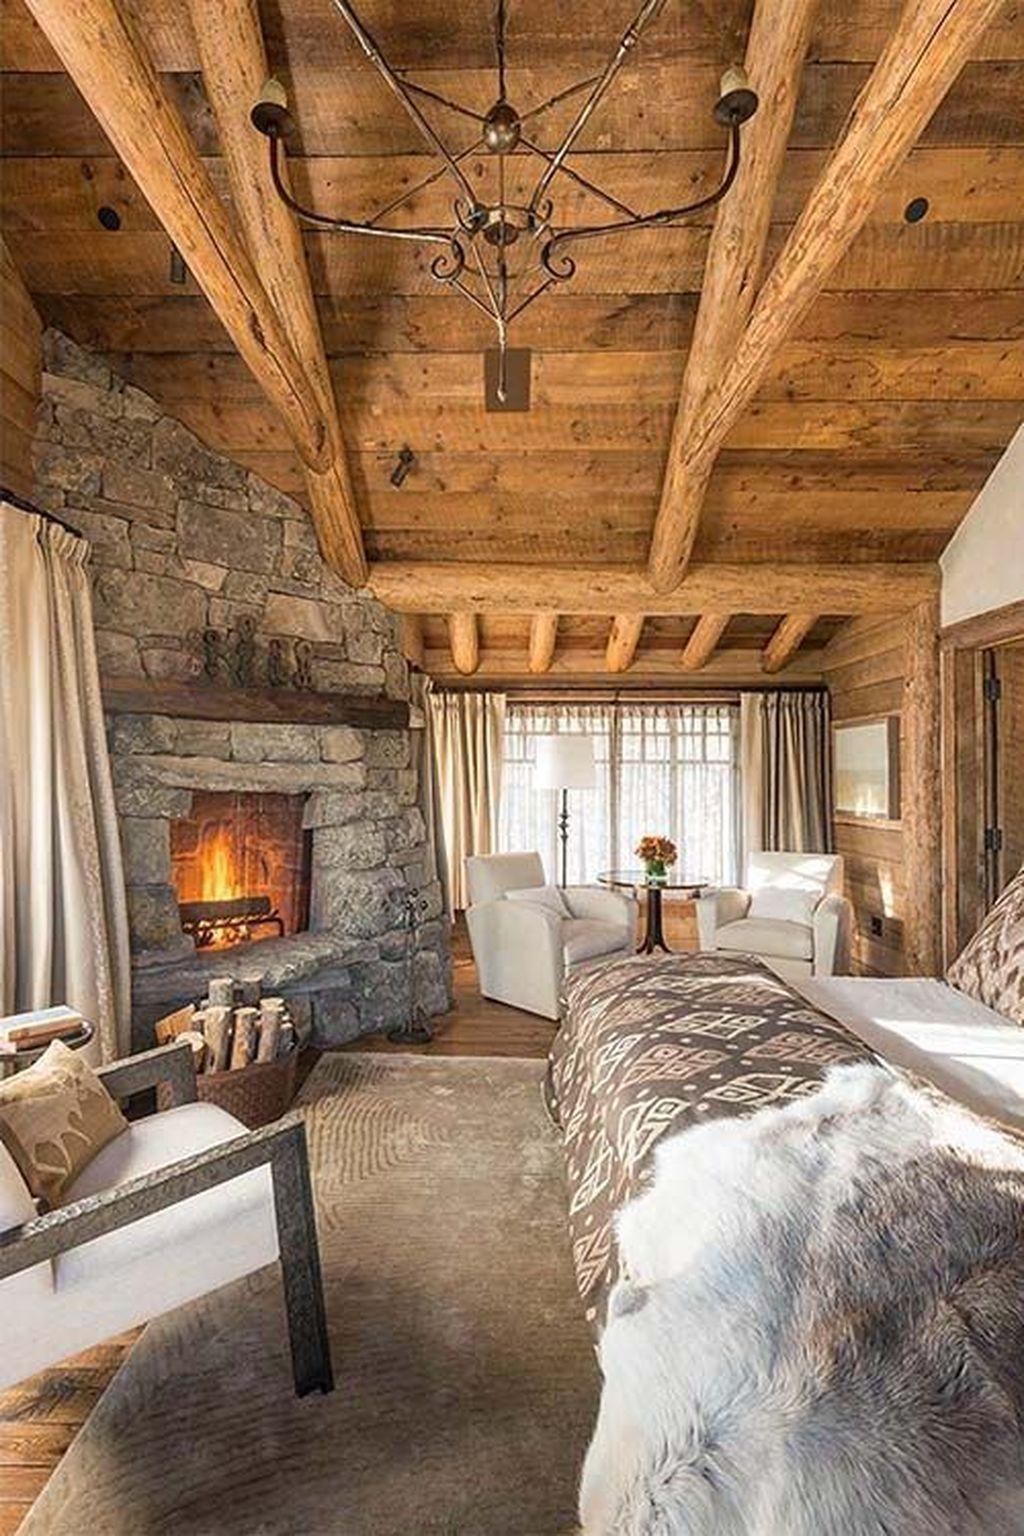 Warm And Cozy Rustic Bedroom Decorating Ideas 12